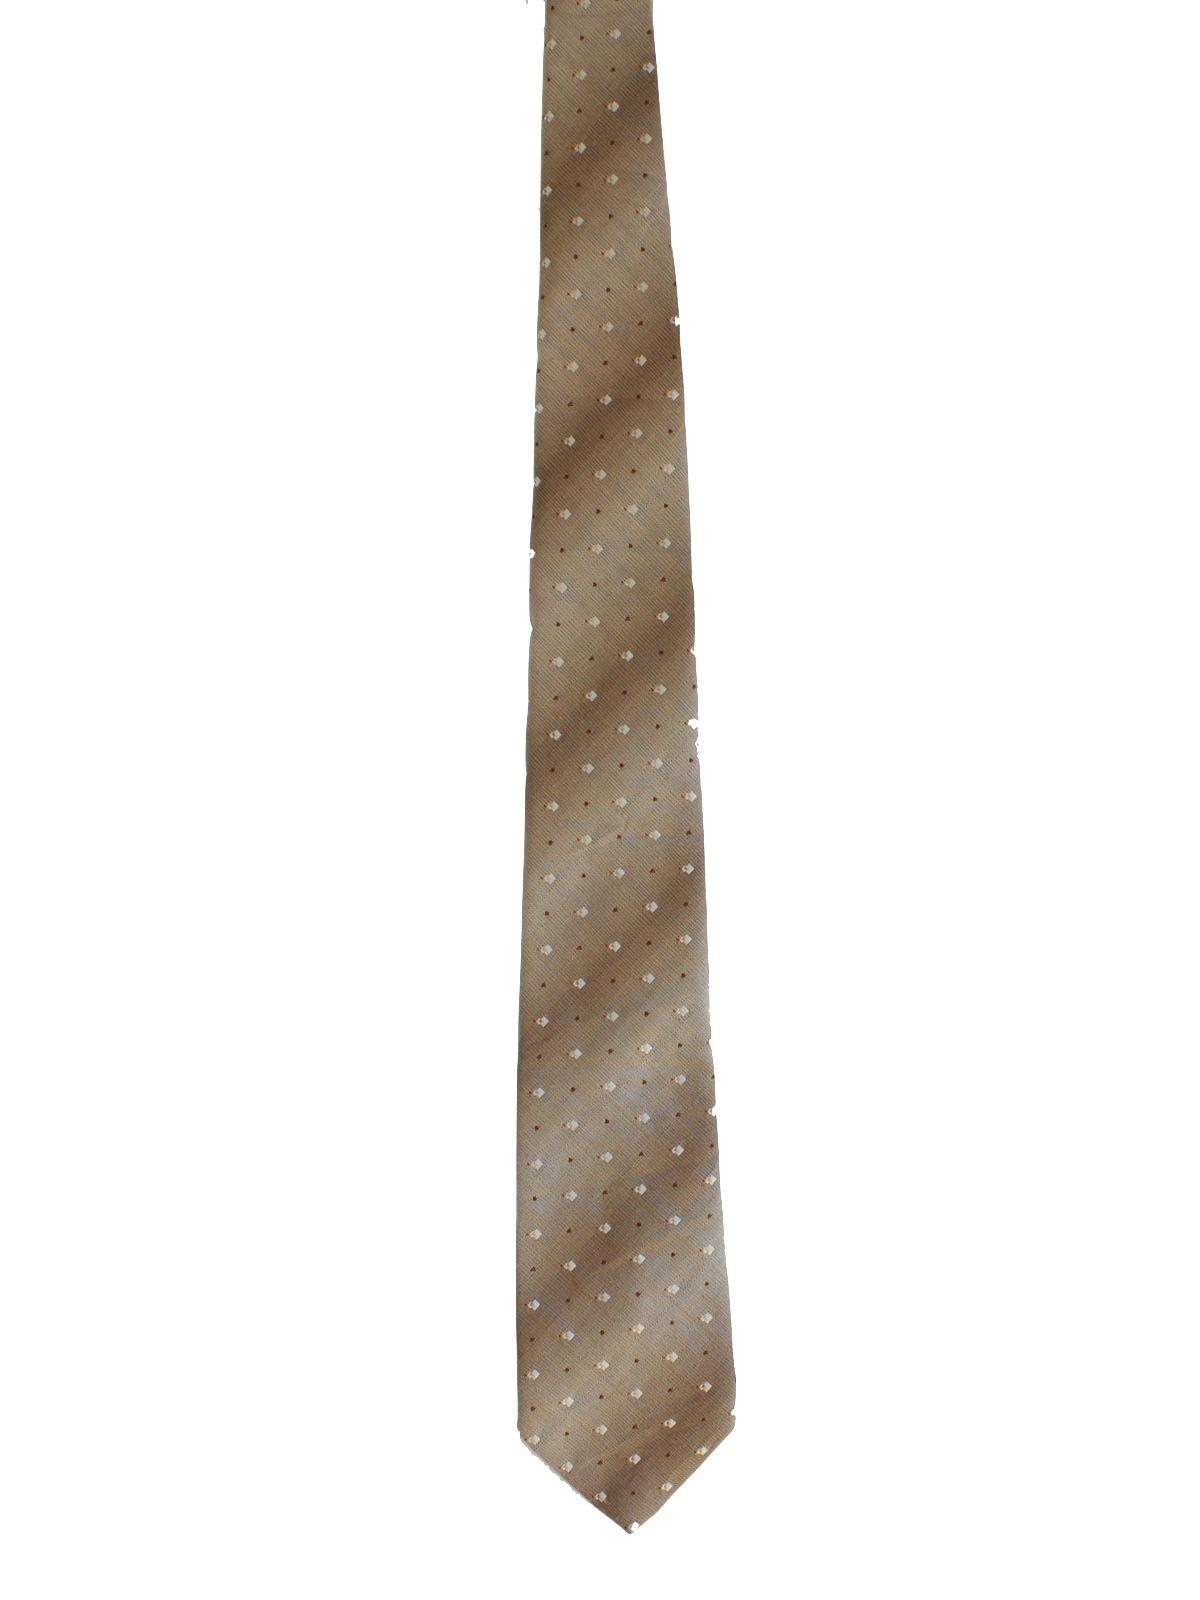 e42e7b31727e94 JCPenney The mens shop 1970s Vintage Neck Tie: 70s -JCPenney The ...